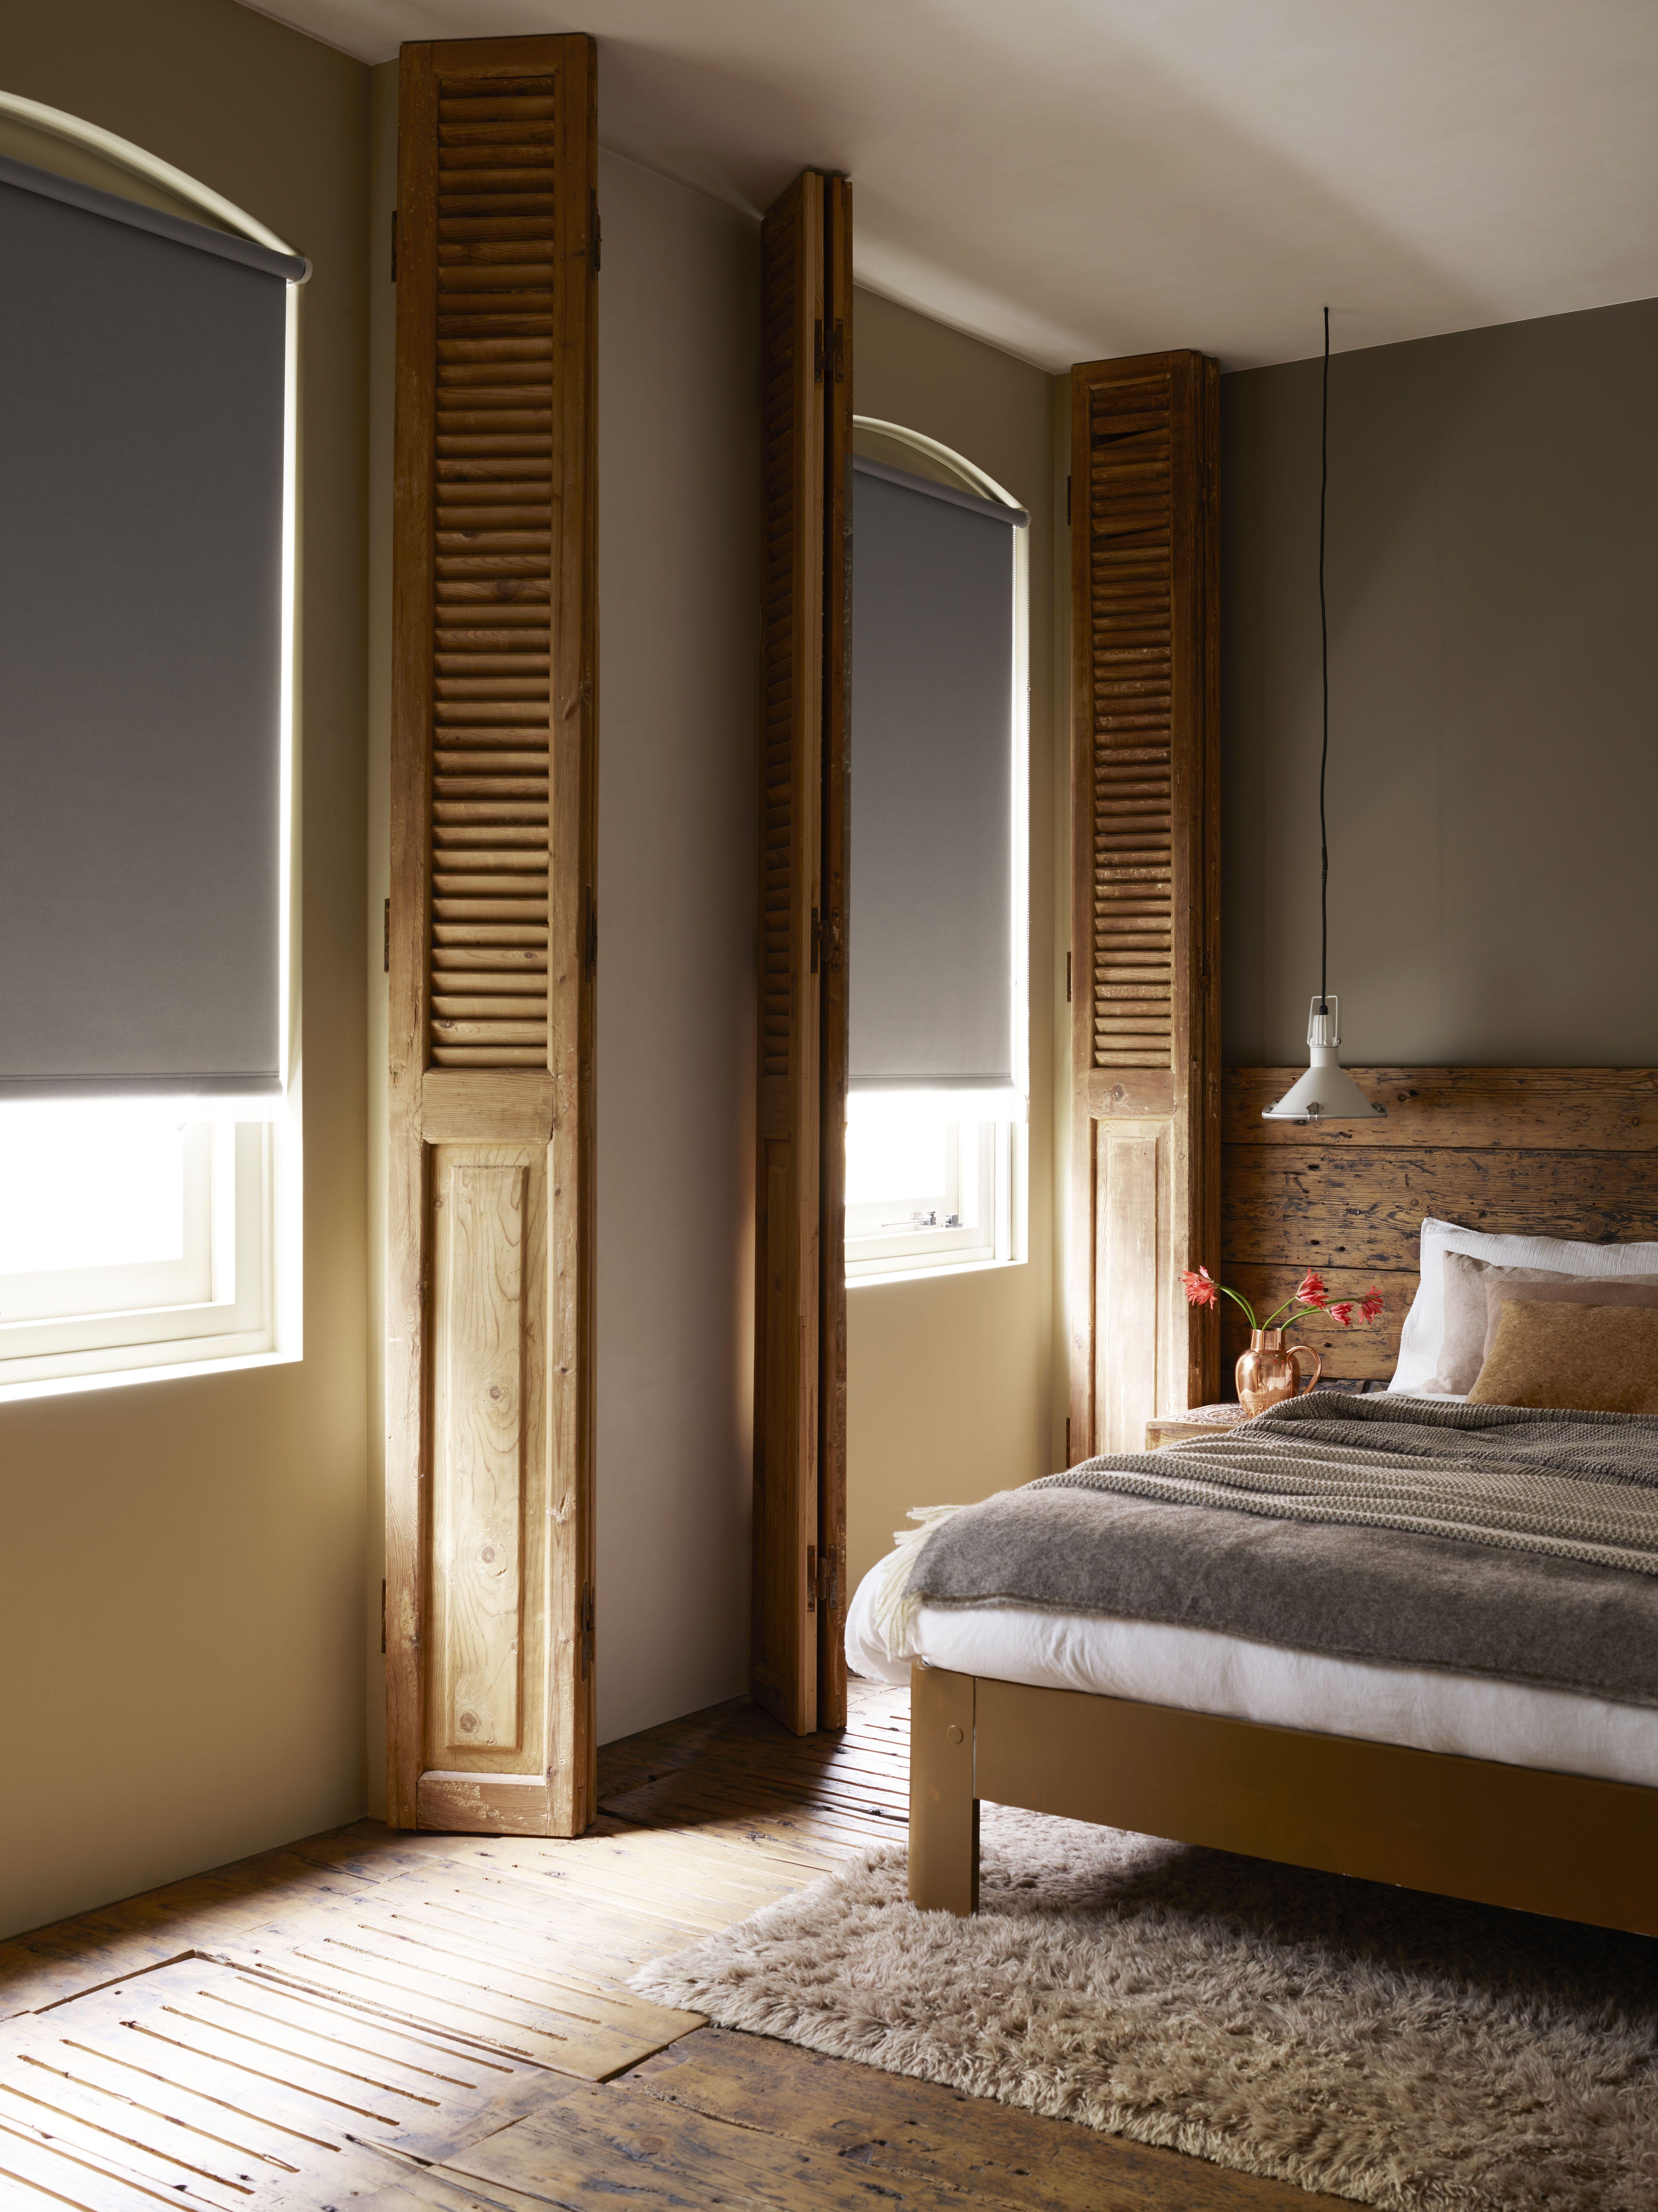 img shades treatments darkening vancouver room newco window